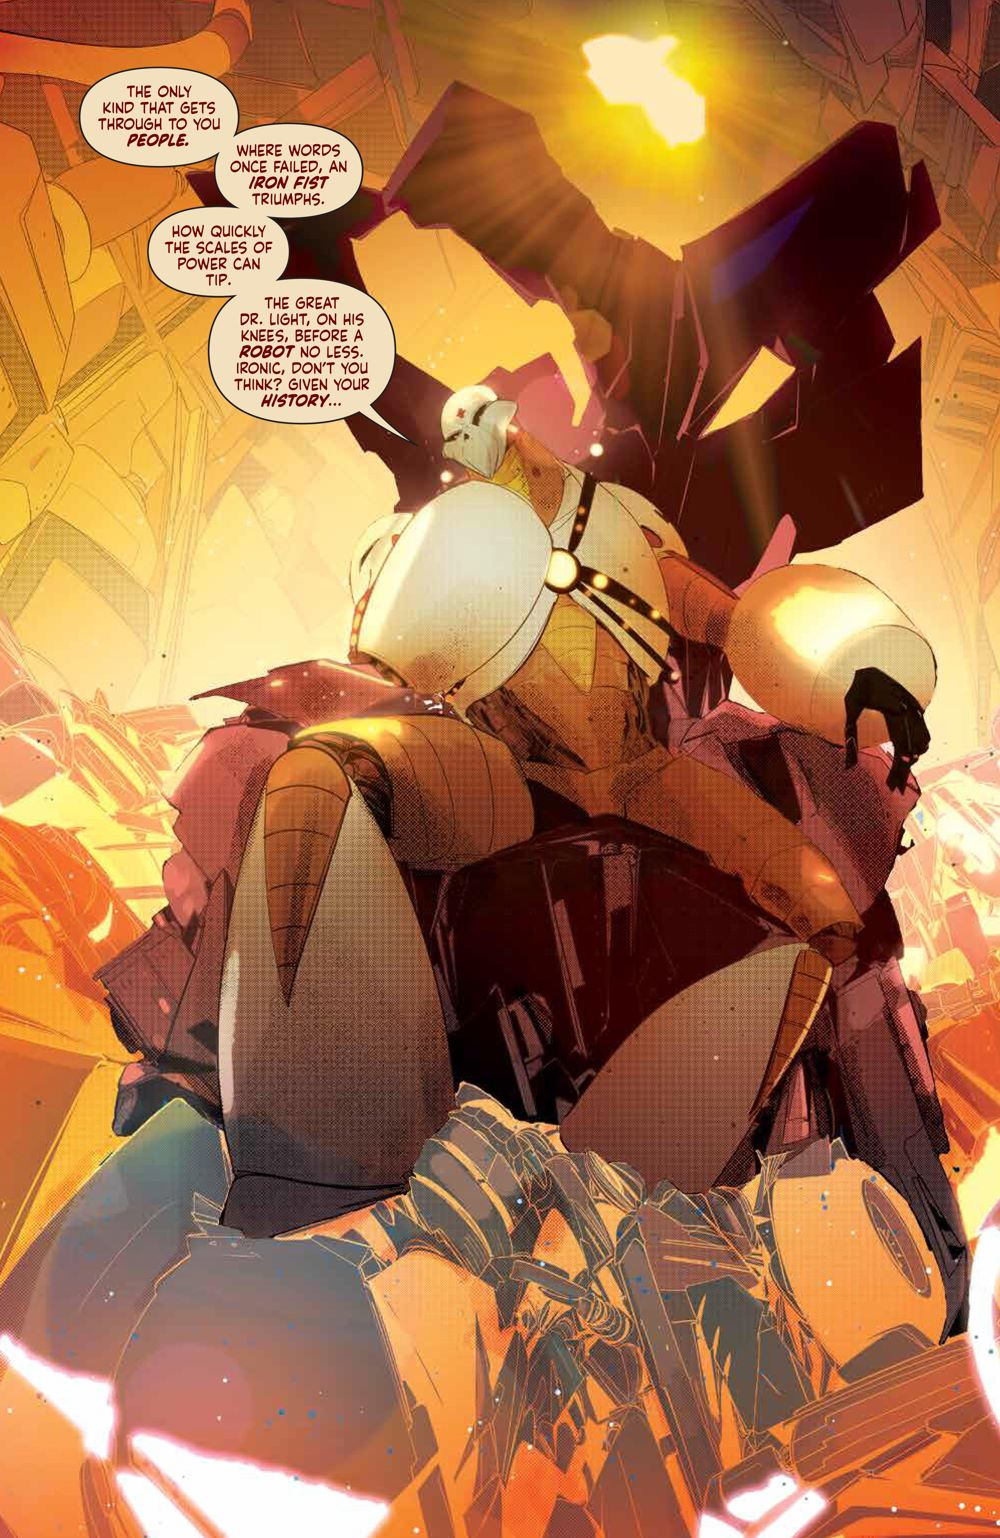 MegaMan_FullyCharged_001_PRESS_8 ComicList Previews: MEGA MAN FULLY CHARGED #1